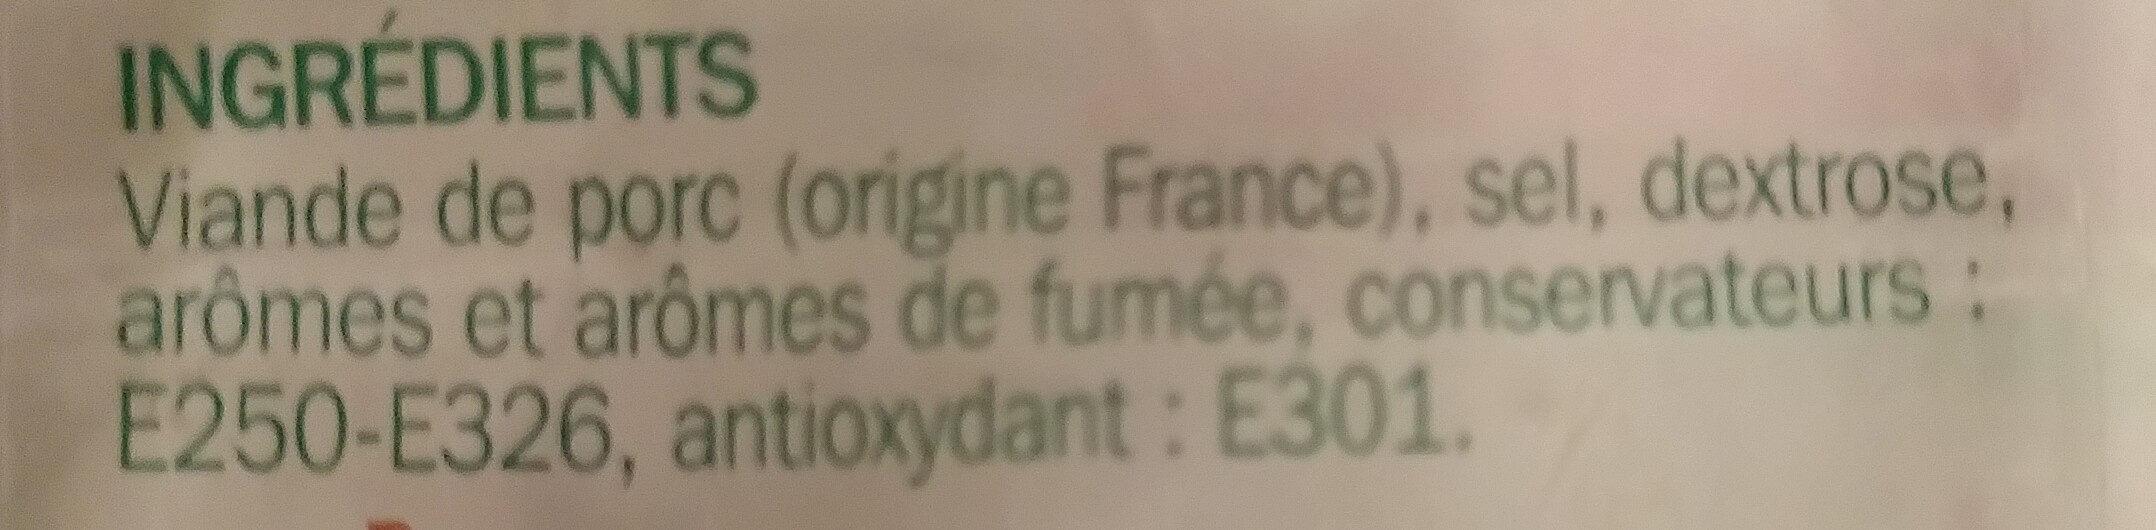 Allumettes de bacon Fumées - Ingrediënten - fr